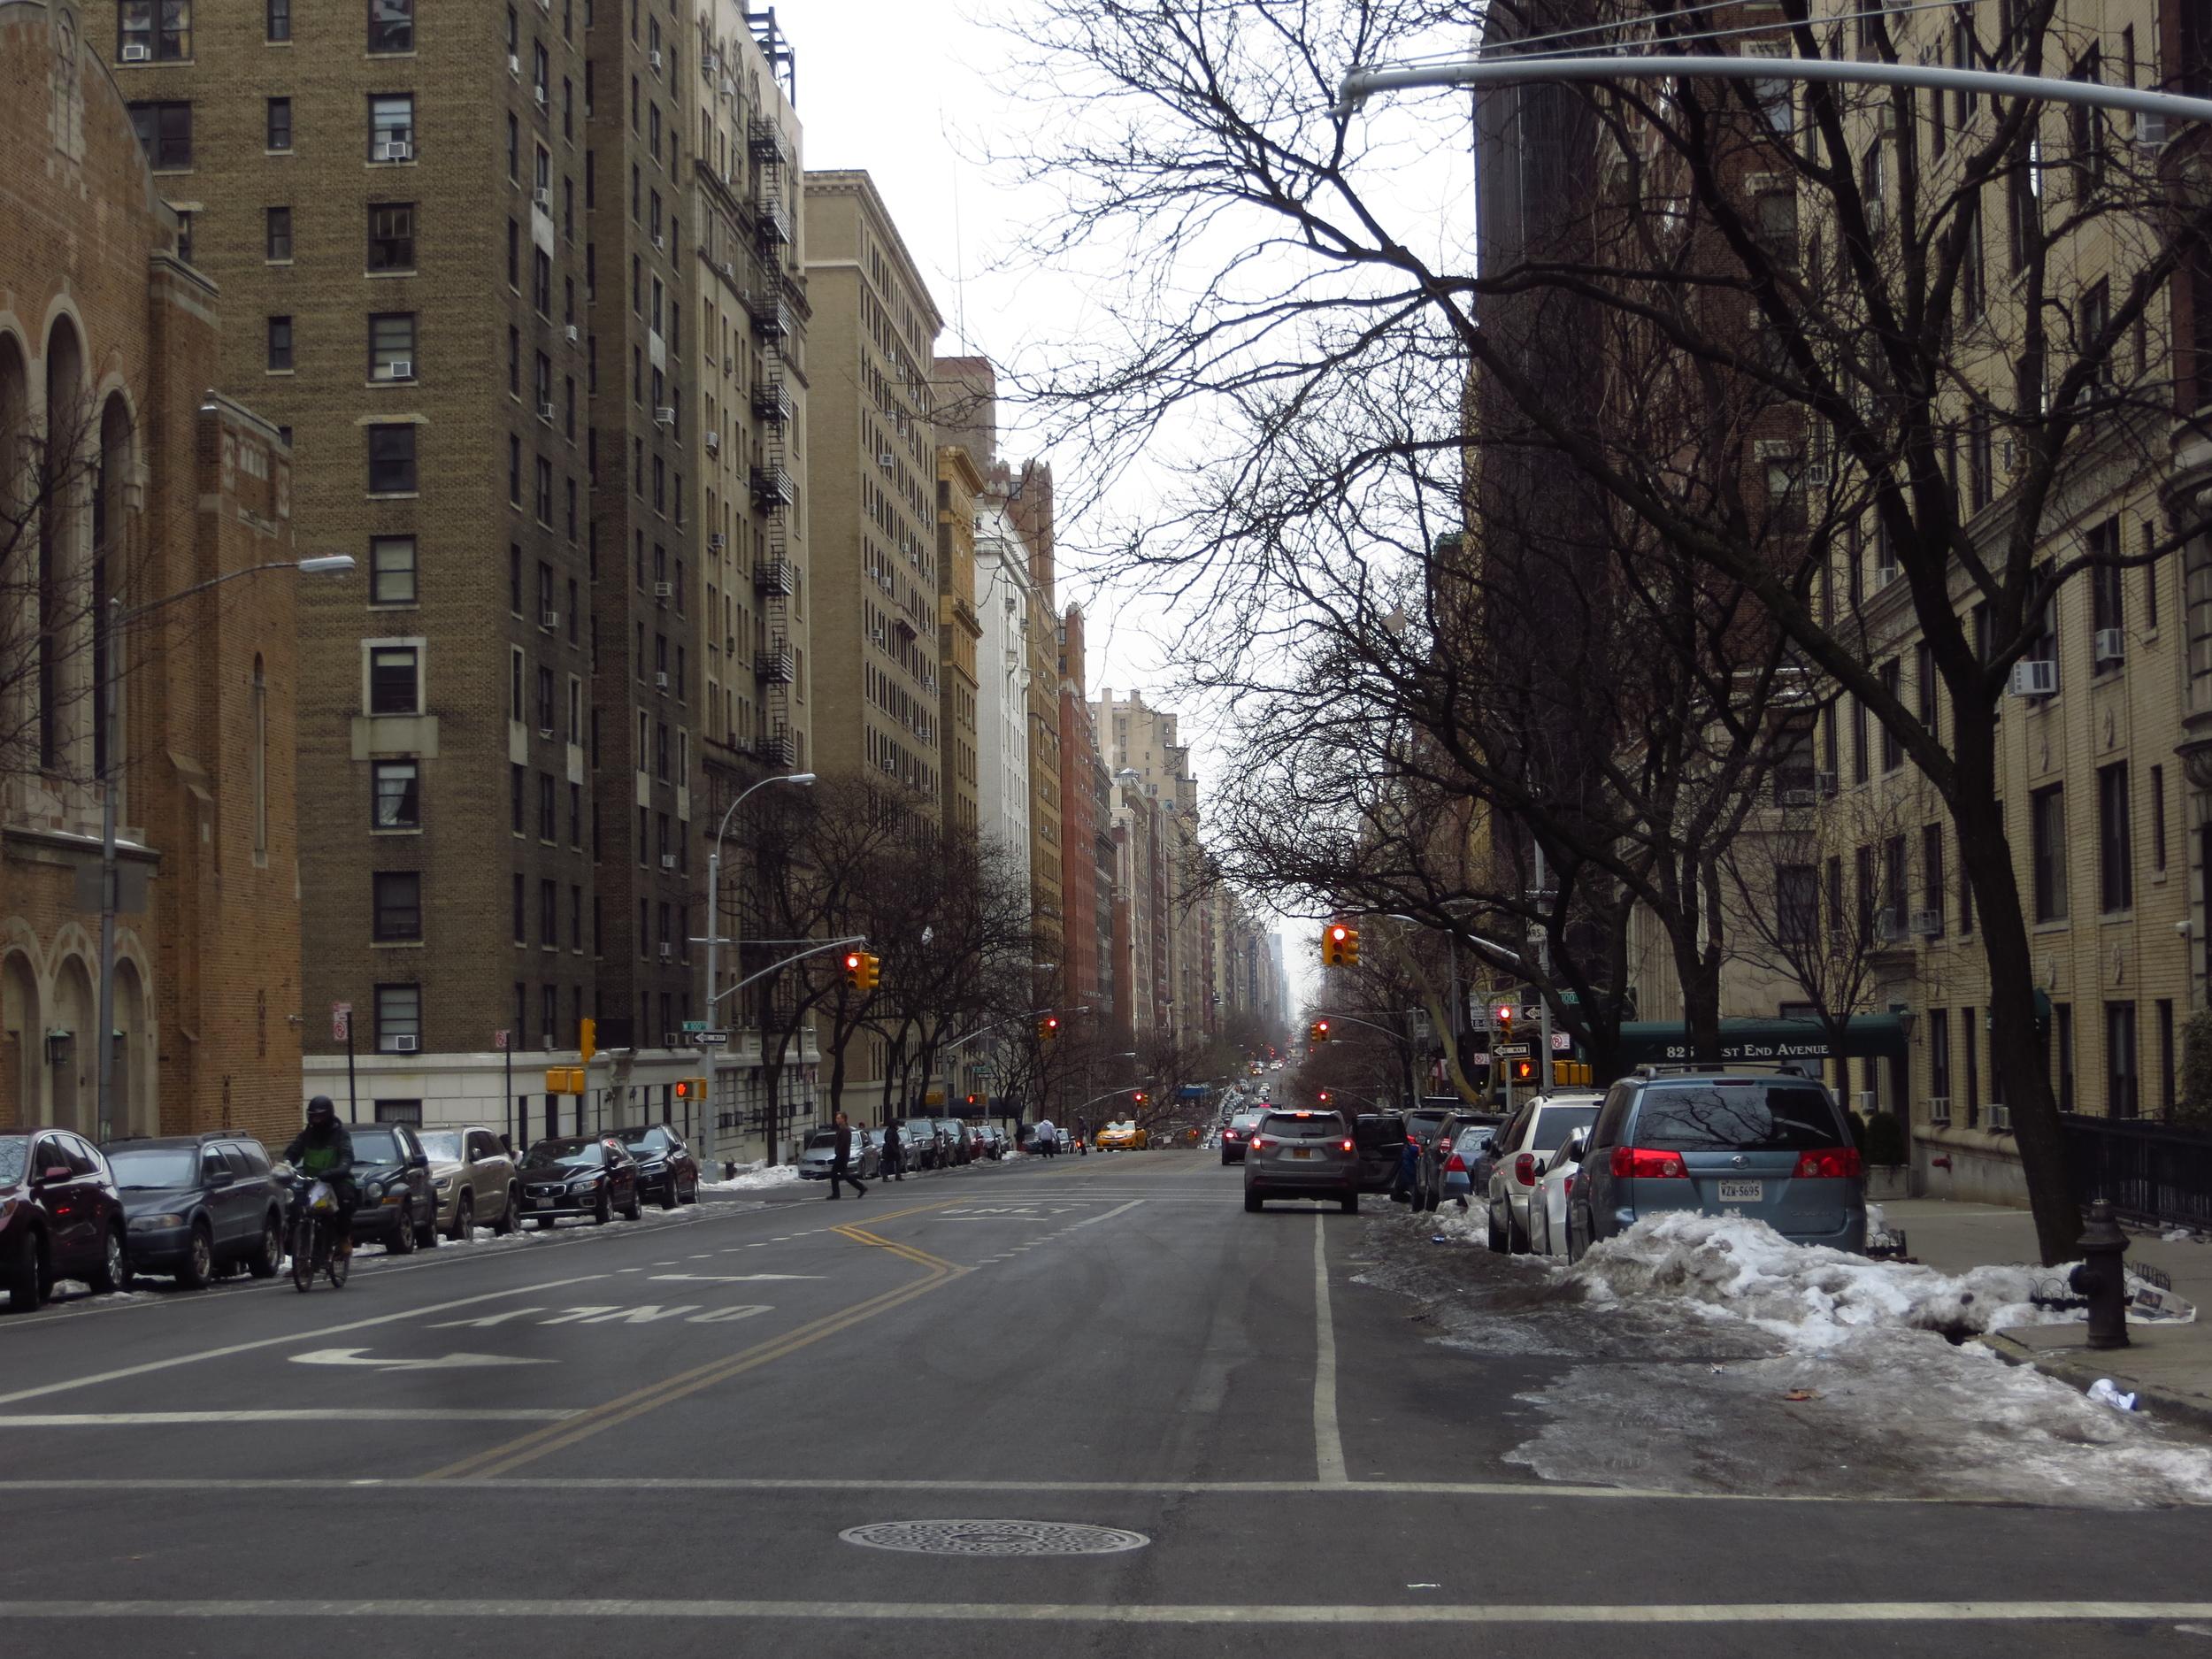 View down West End Avenue